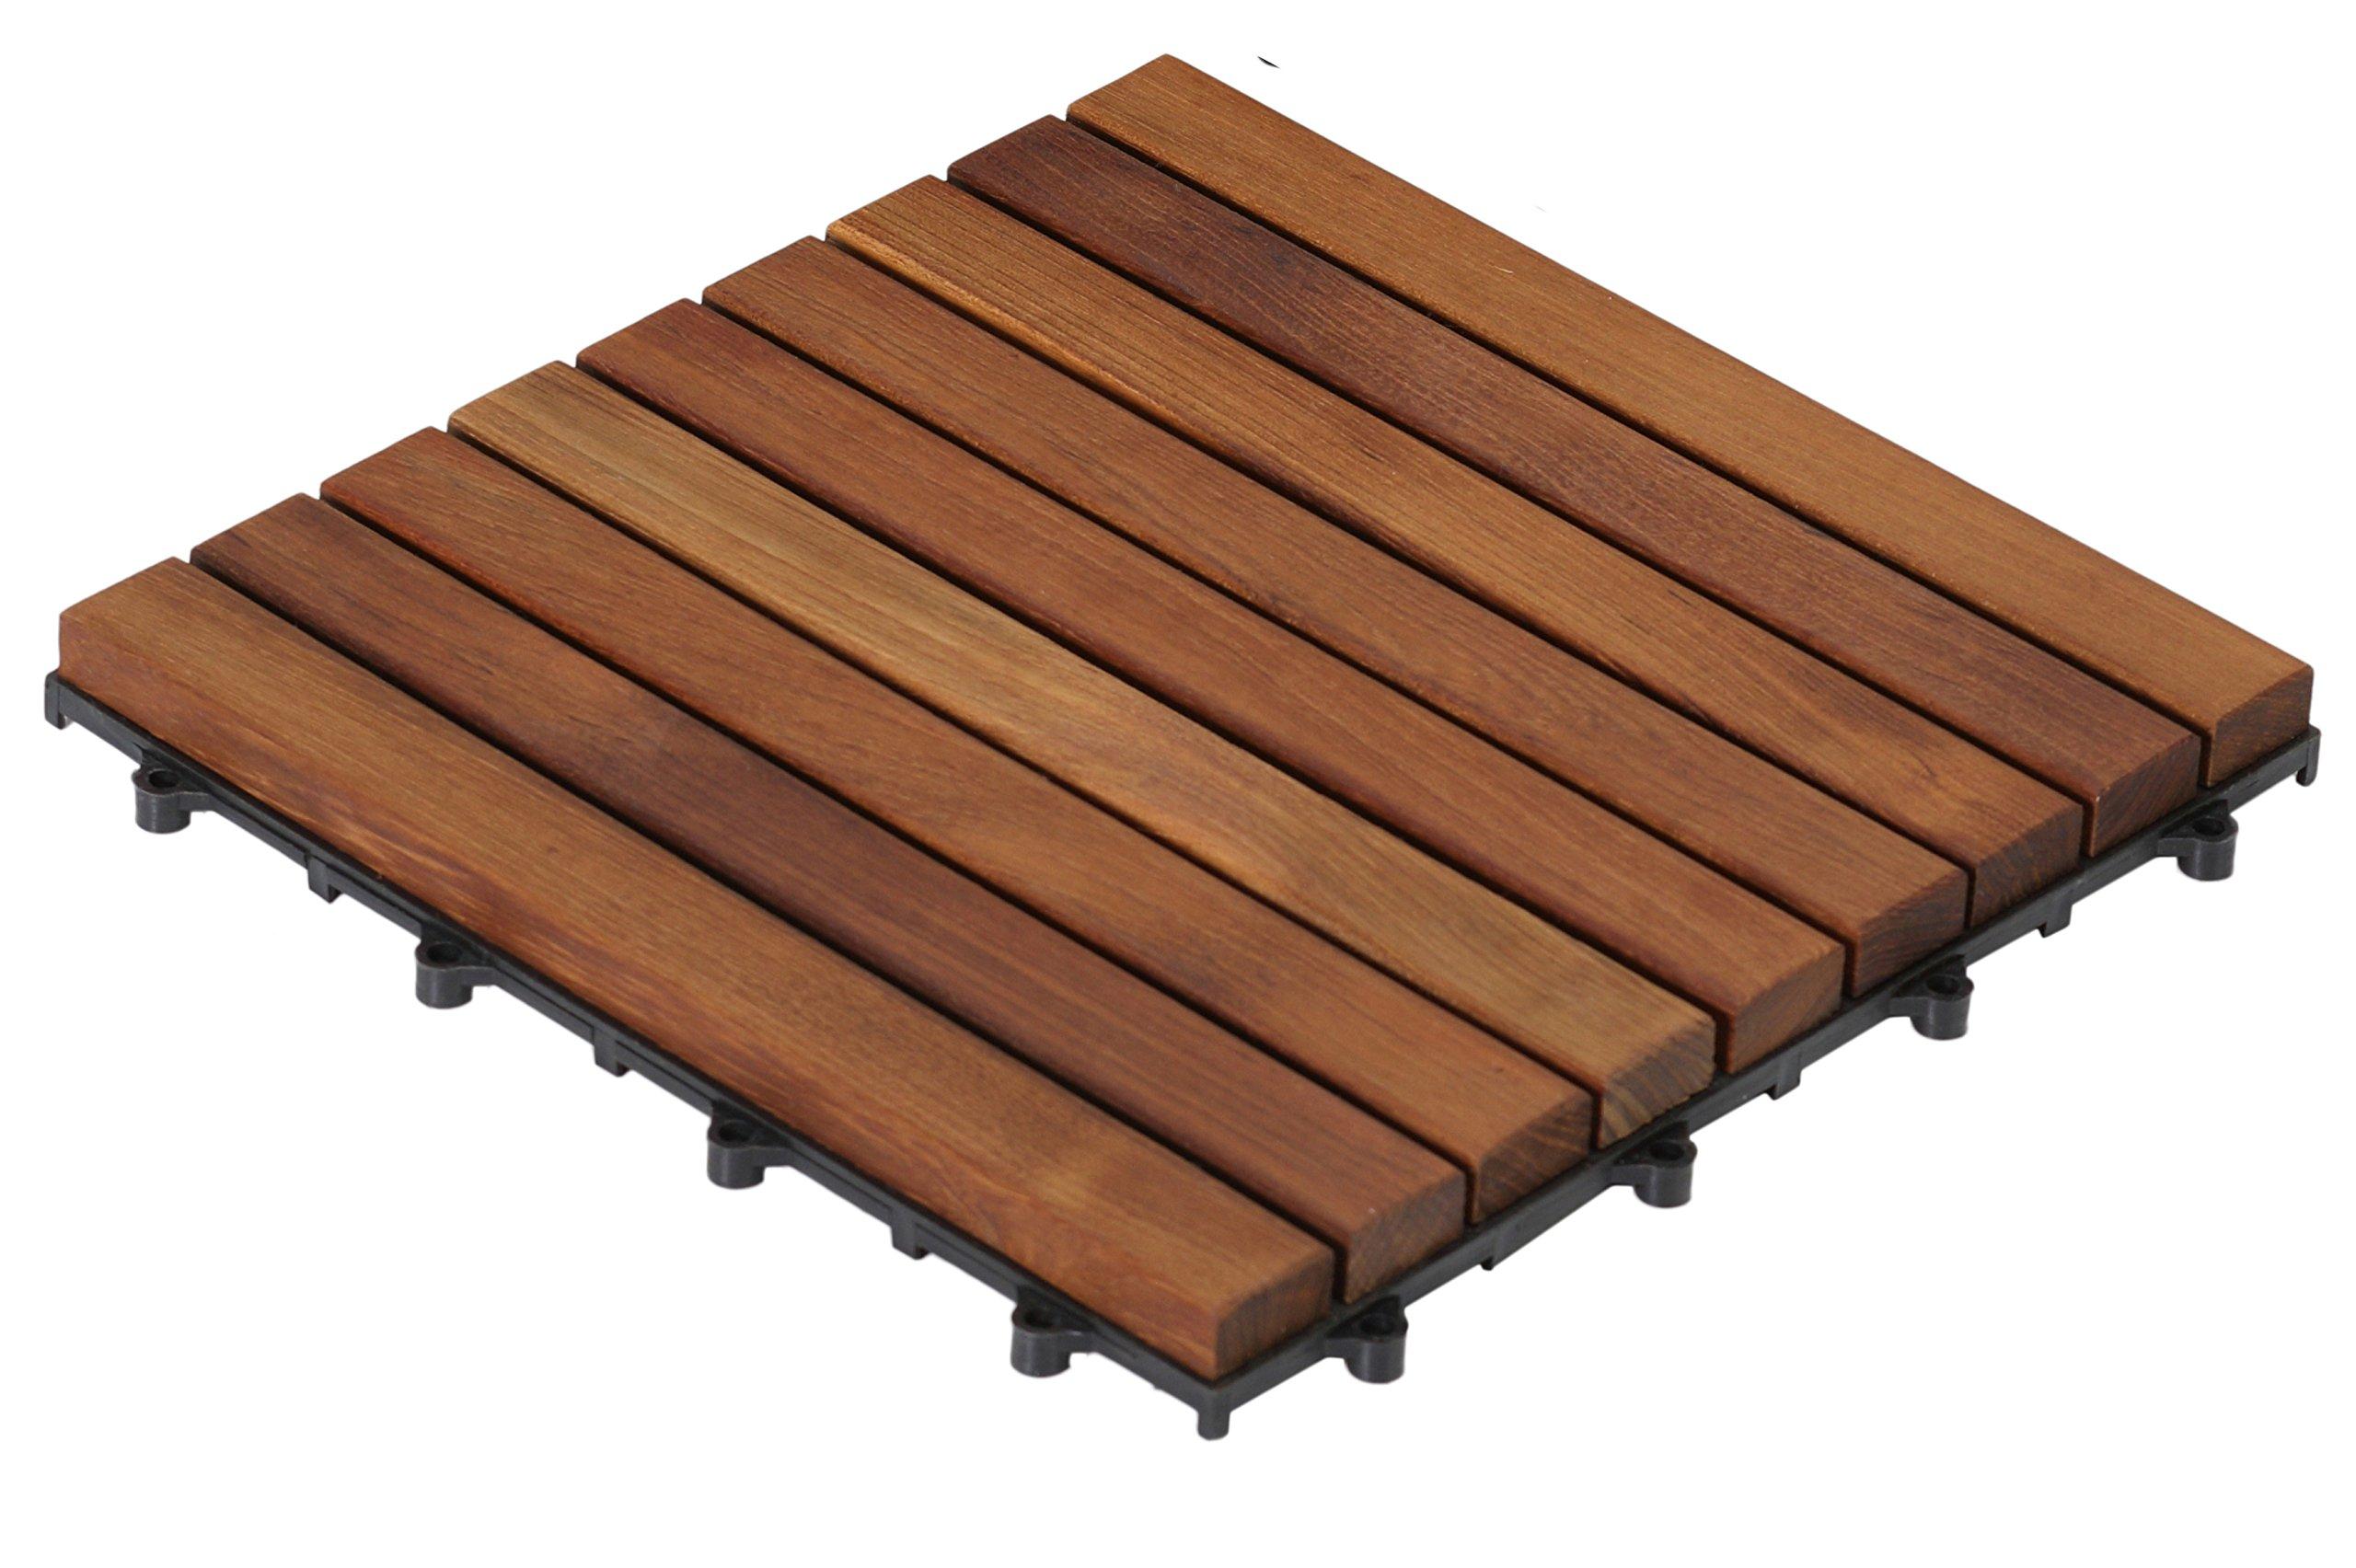 Bare Decor EZ-Floor in Solid Teak Wood, 1 TILE ONLY, Long Slat